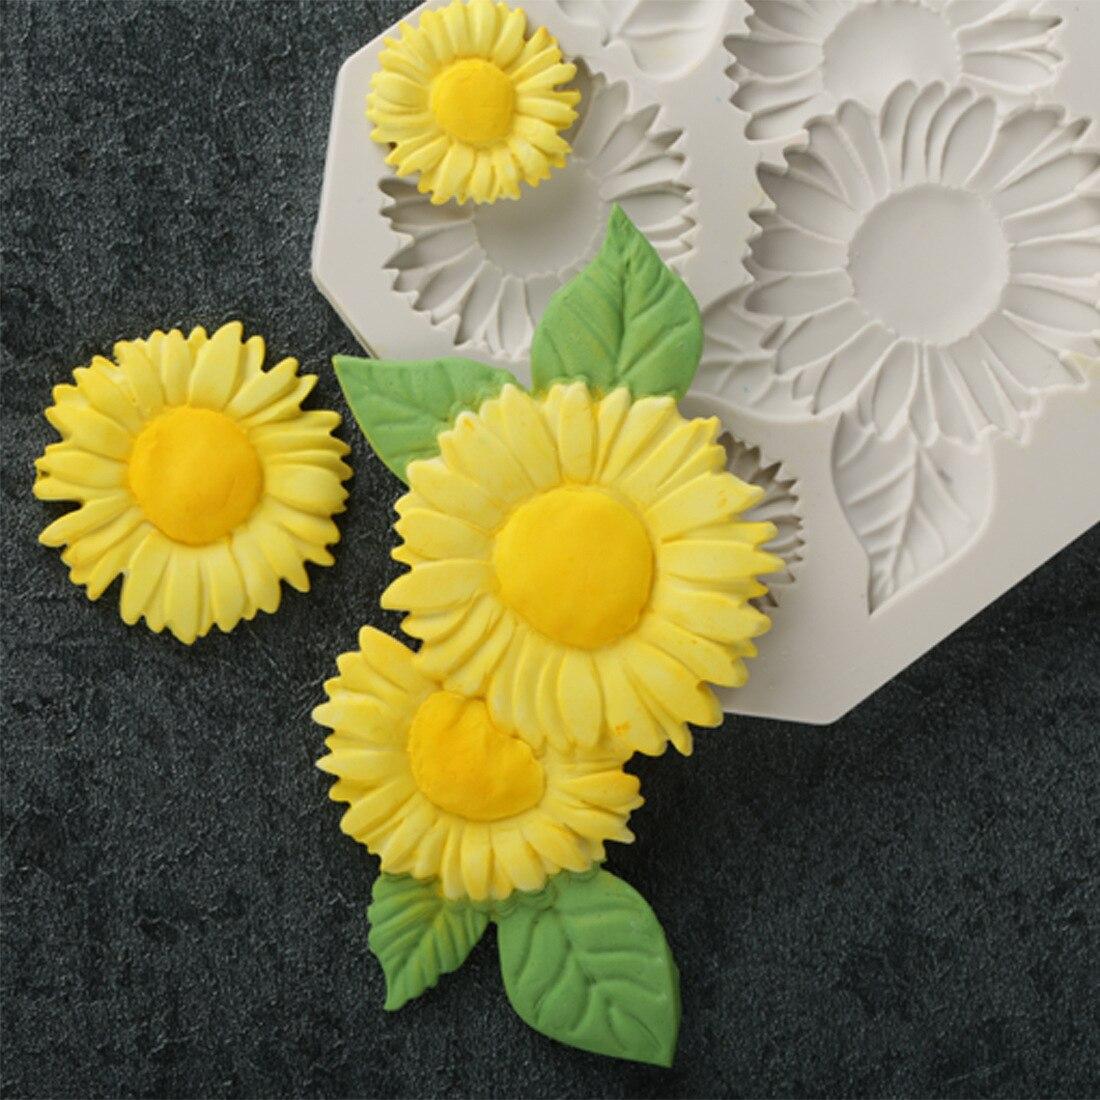 Sunflower Flower Silicone Mold Fondant Mat Cake Decorating Cupcake Candy Baking